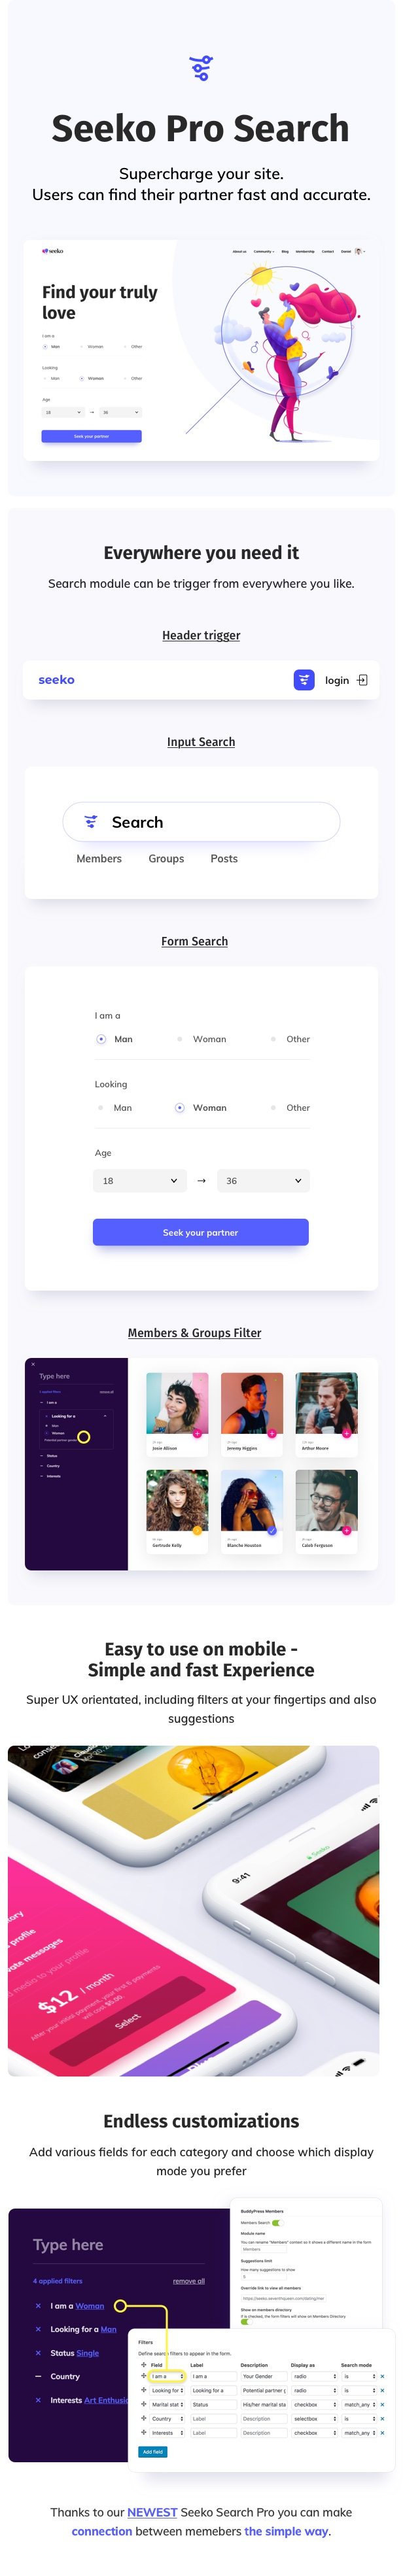 Seeko - Community Site Builder with BuddyPress SuperPowers - 6